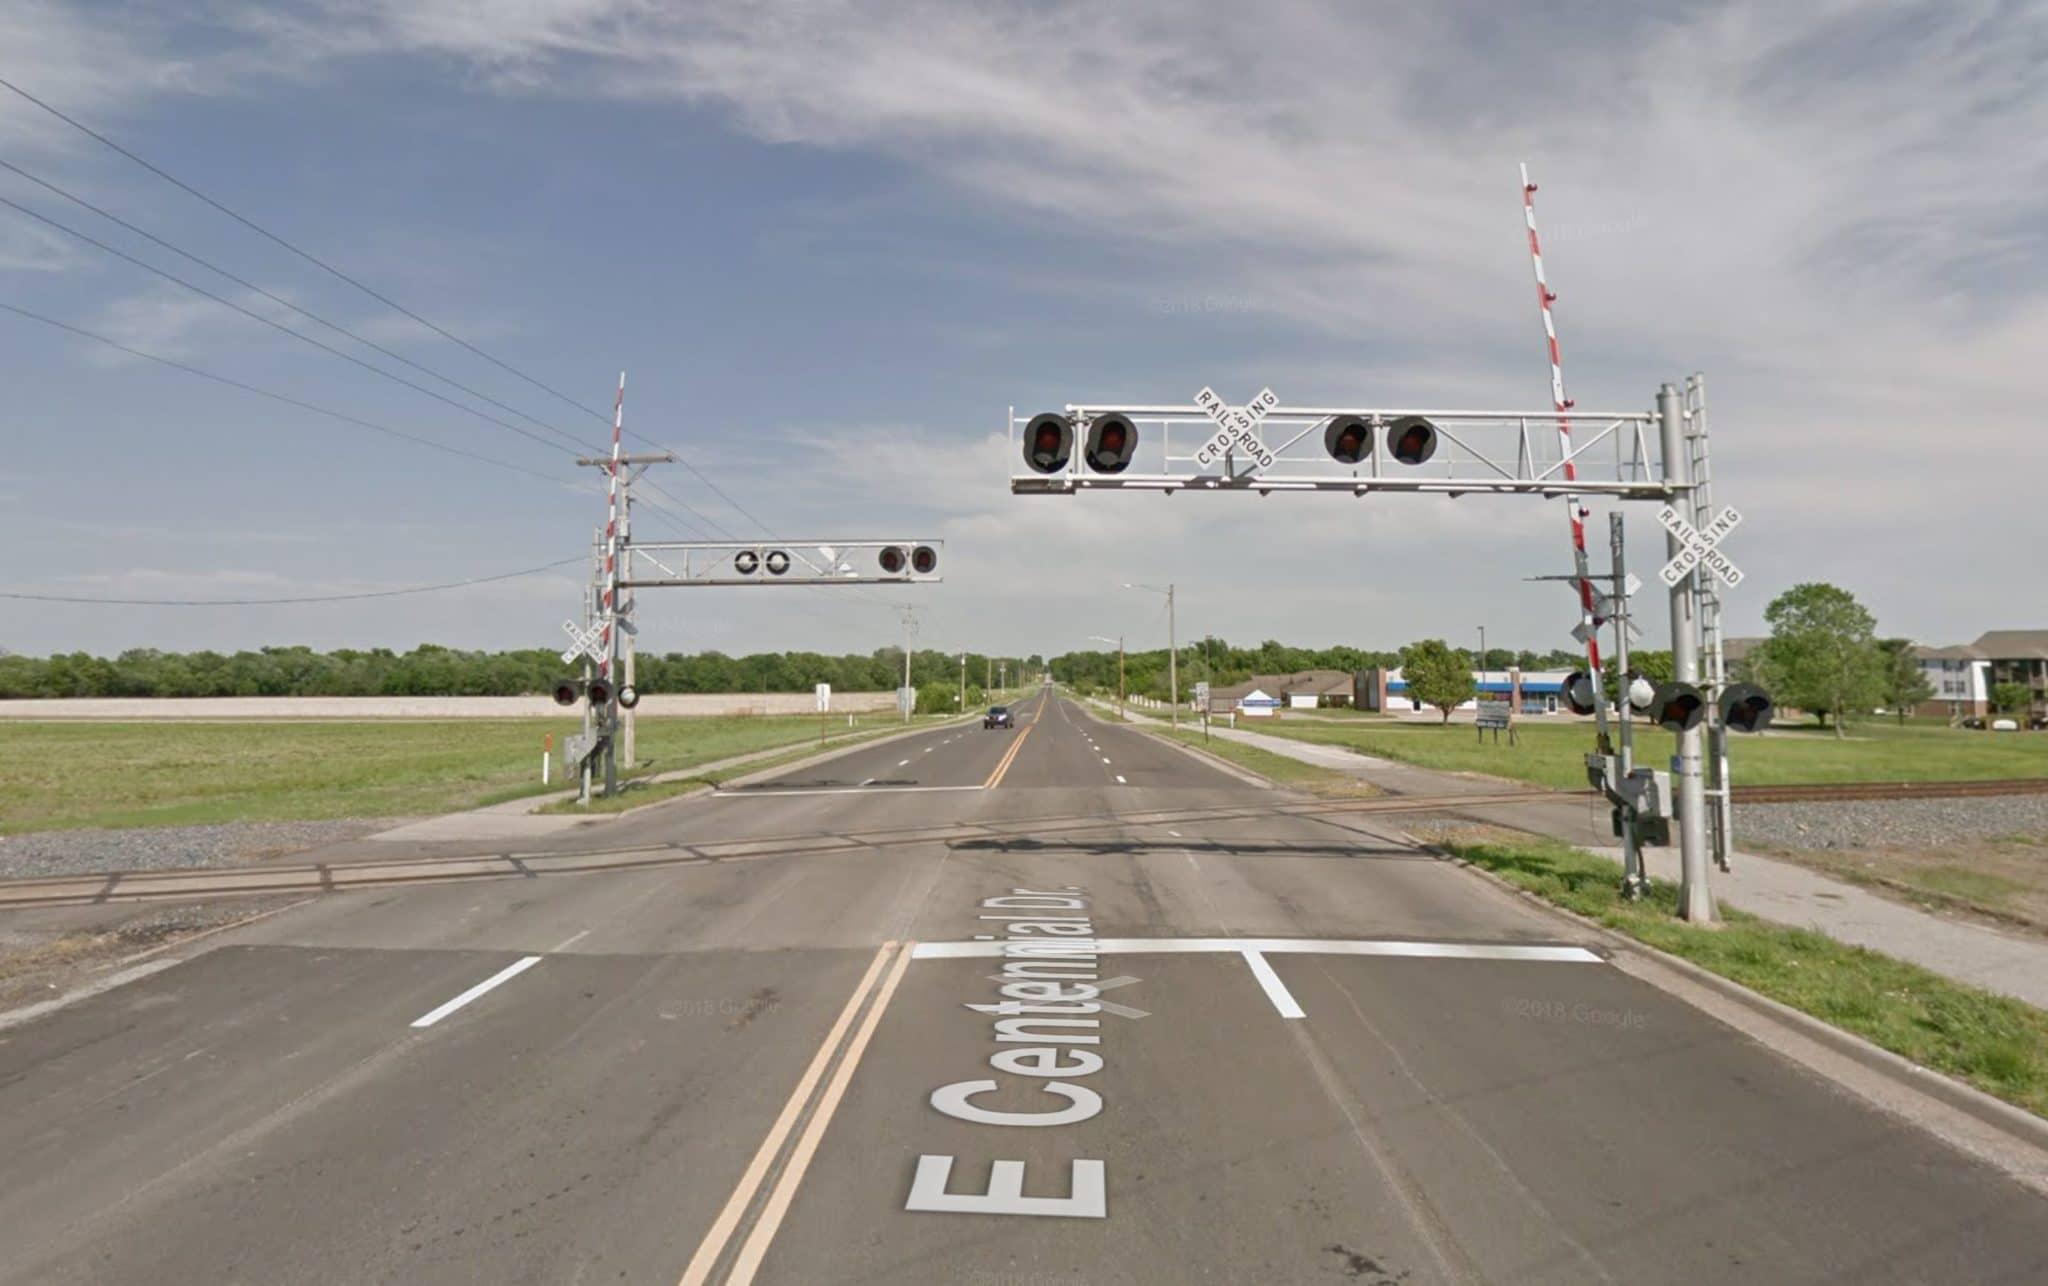 Road closure at Centennial Dr. railroad crossing